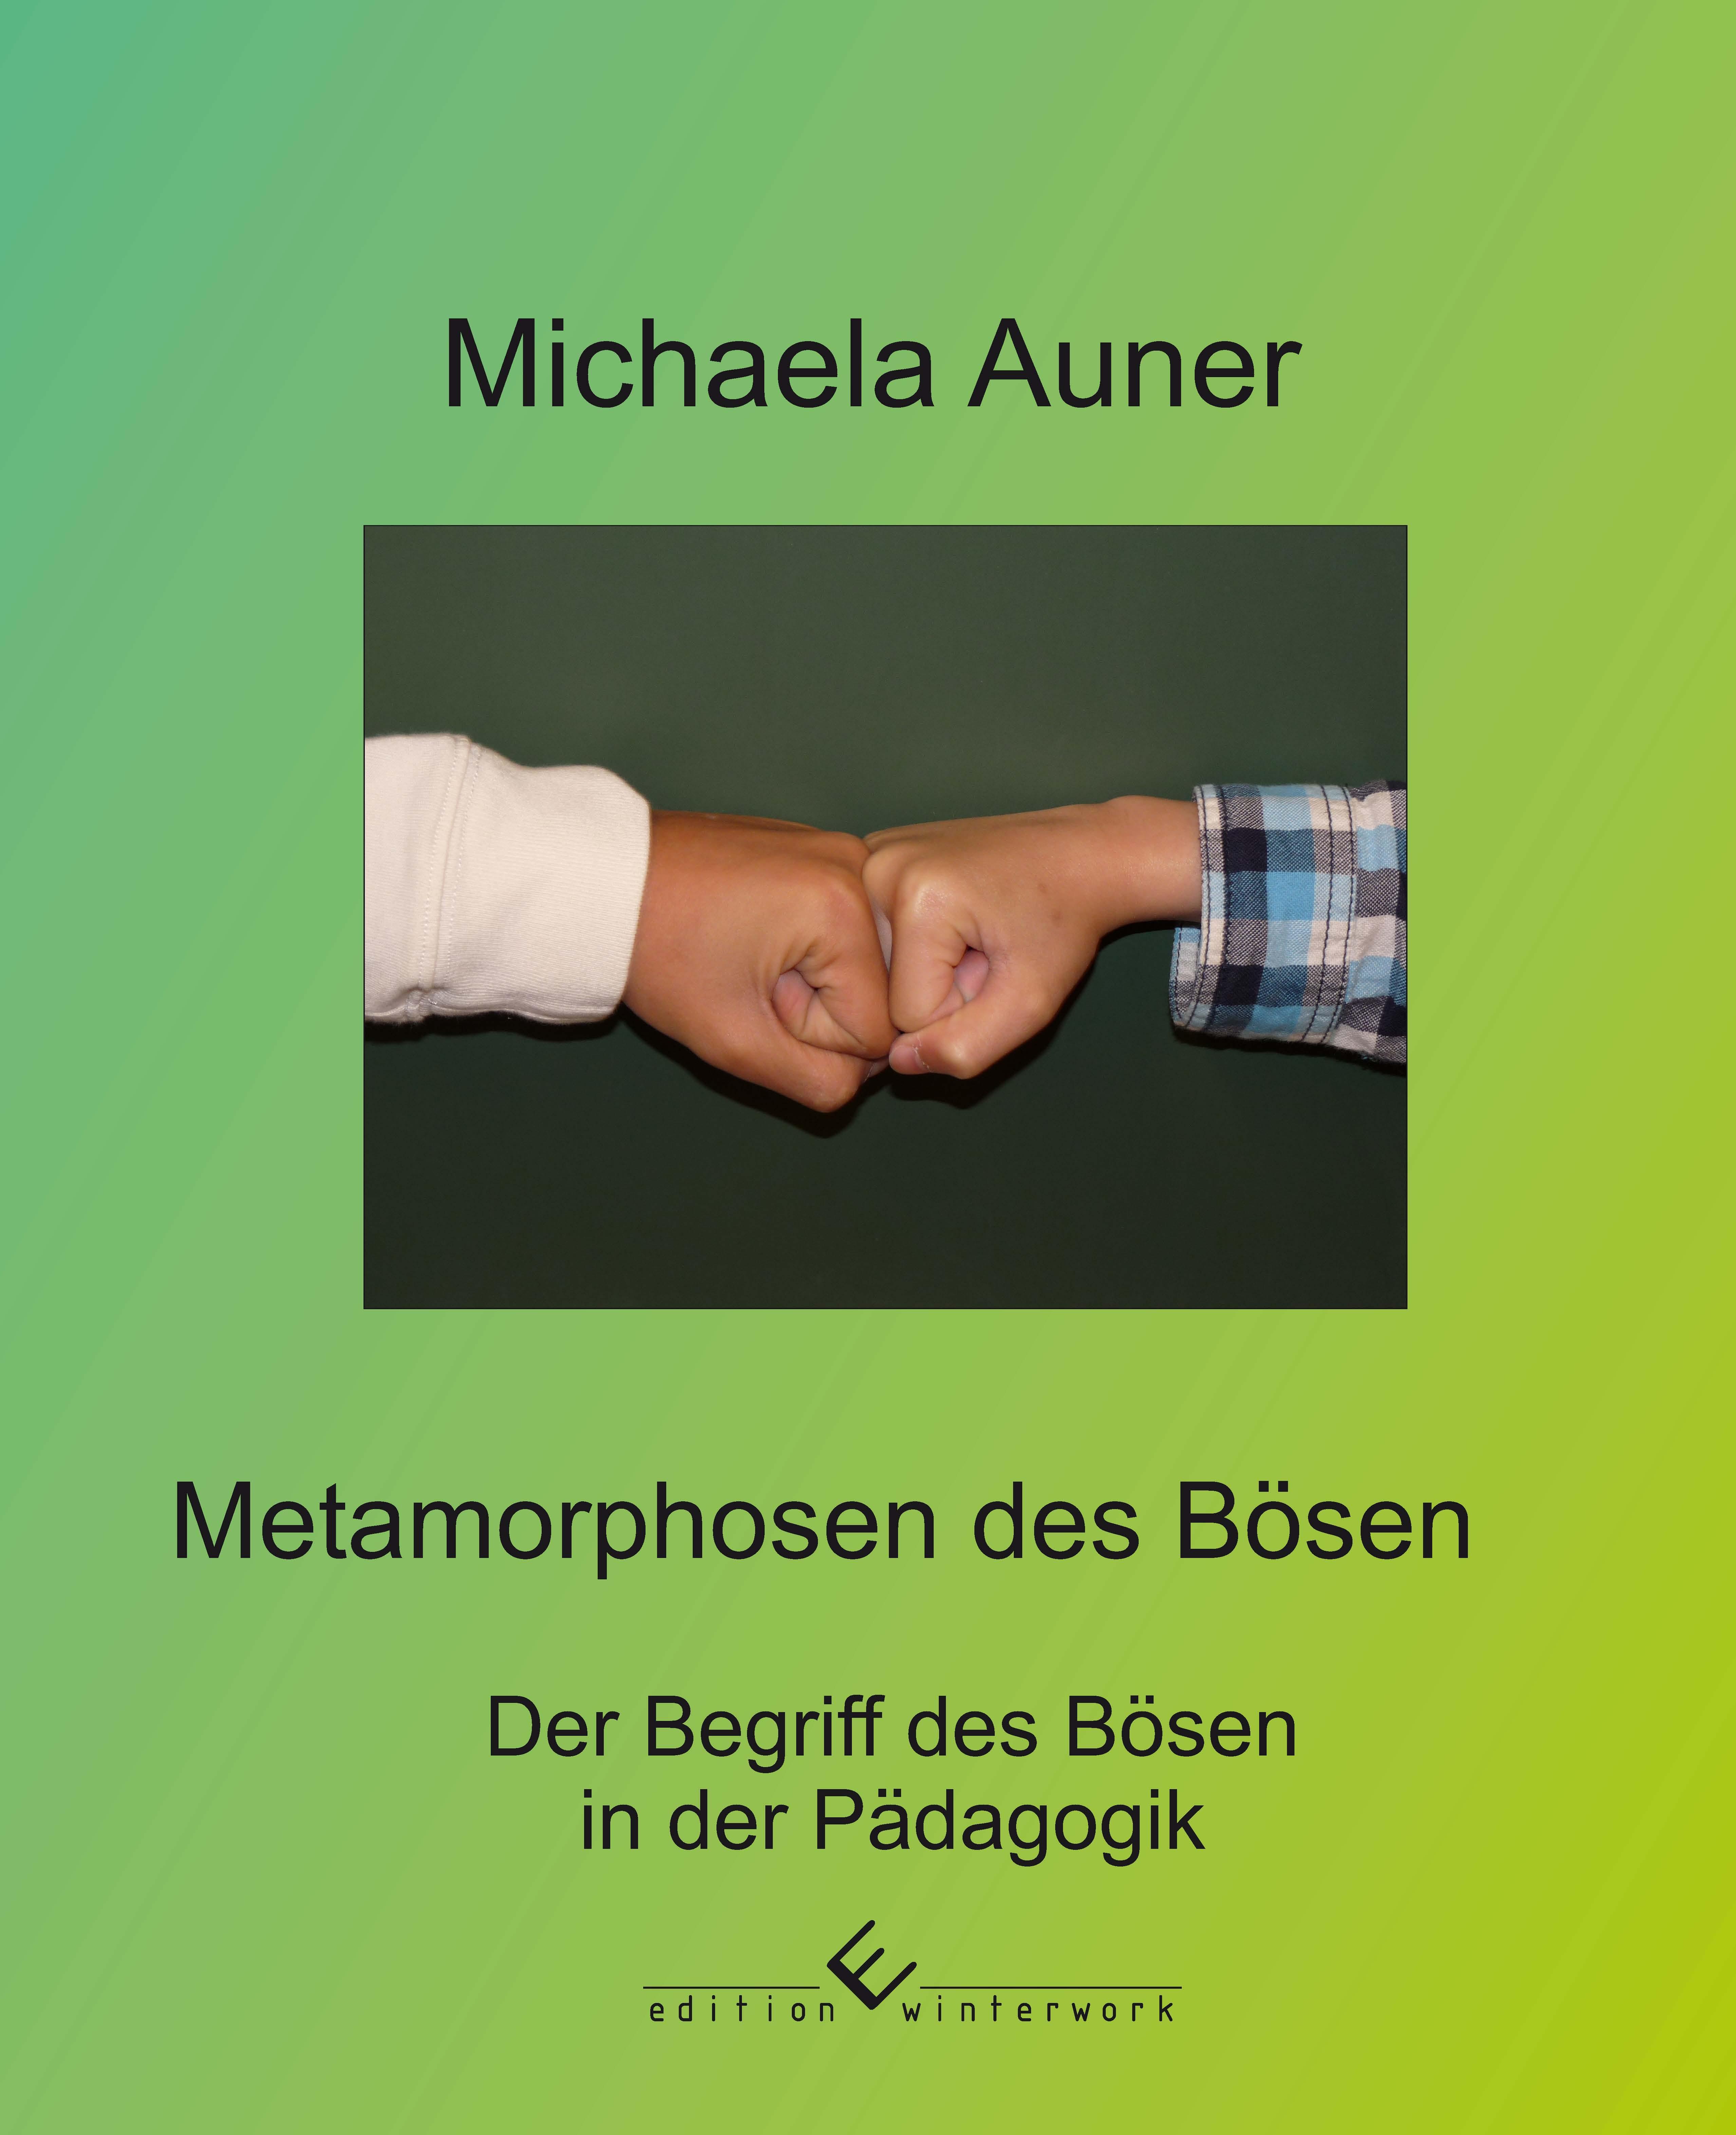 Metamorphosen des Bösen Michaela Auner